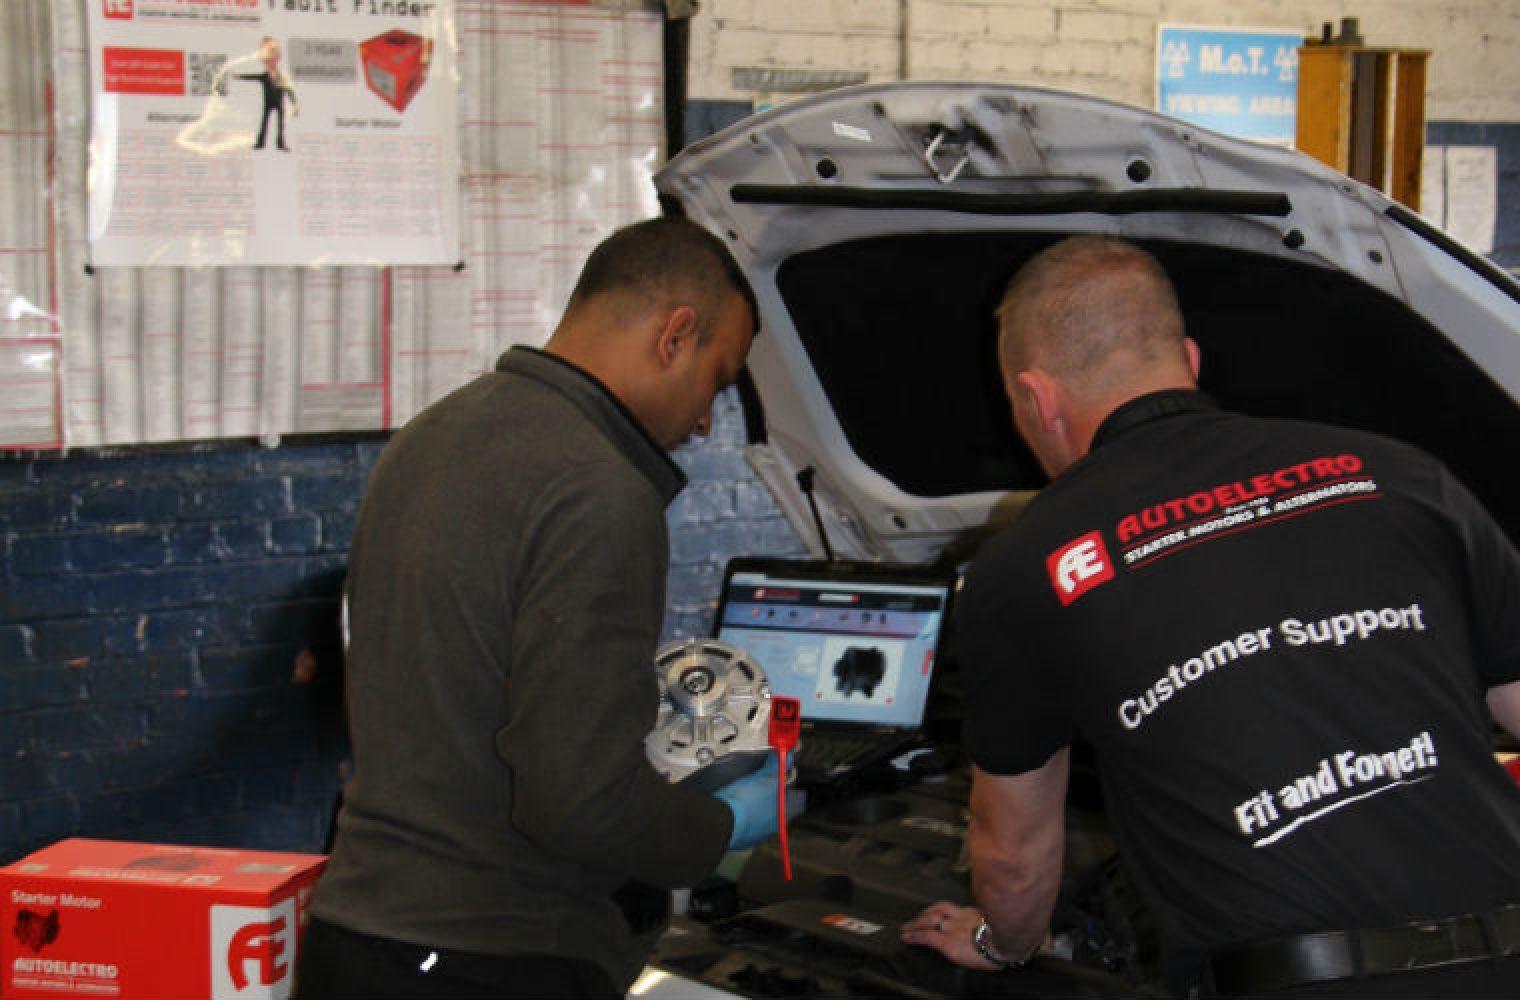 Corroded earth causing Fiat Grande Punto starter failure